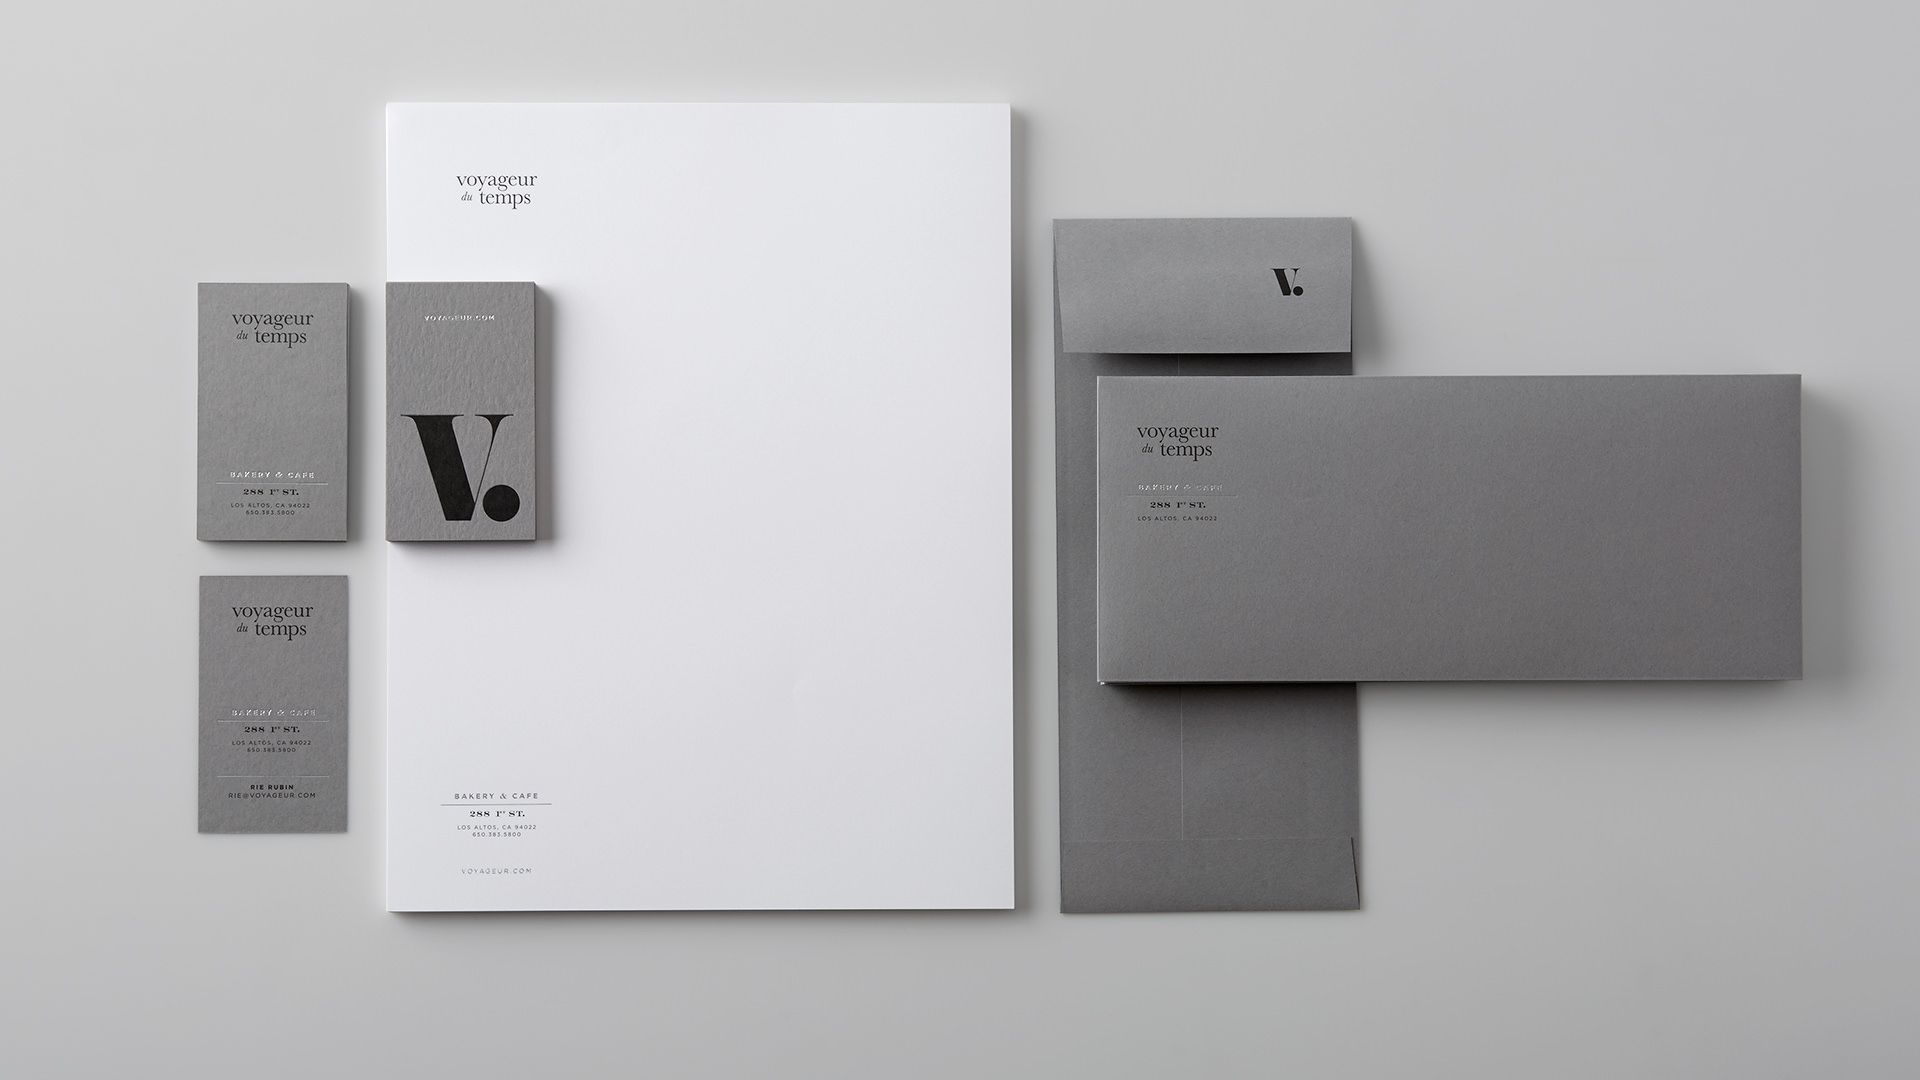 Voyageur du temps branding 5 graphic design pinterest for Design agency san francisco